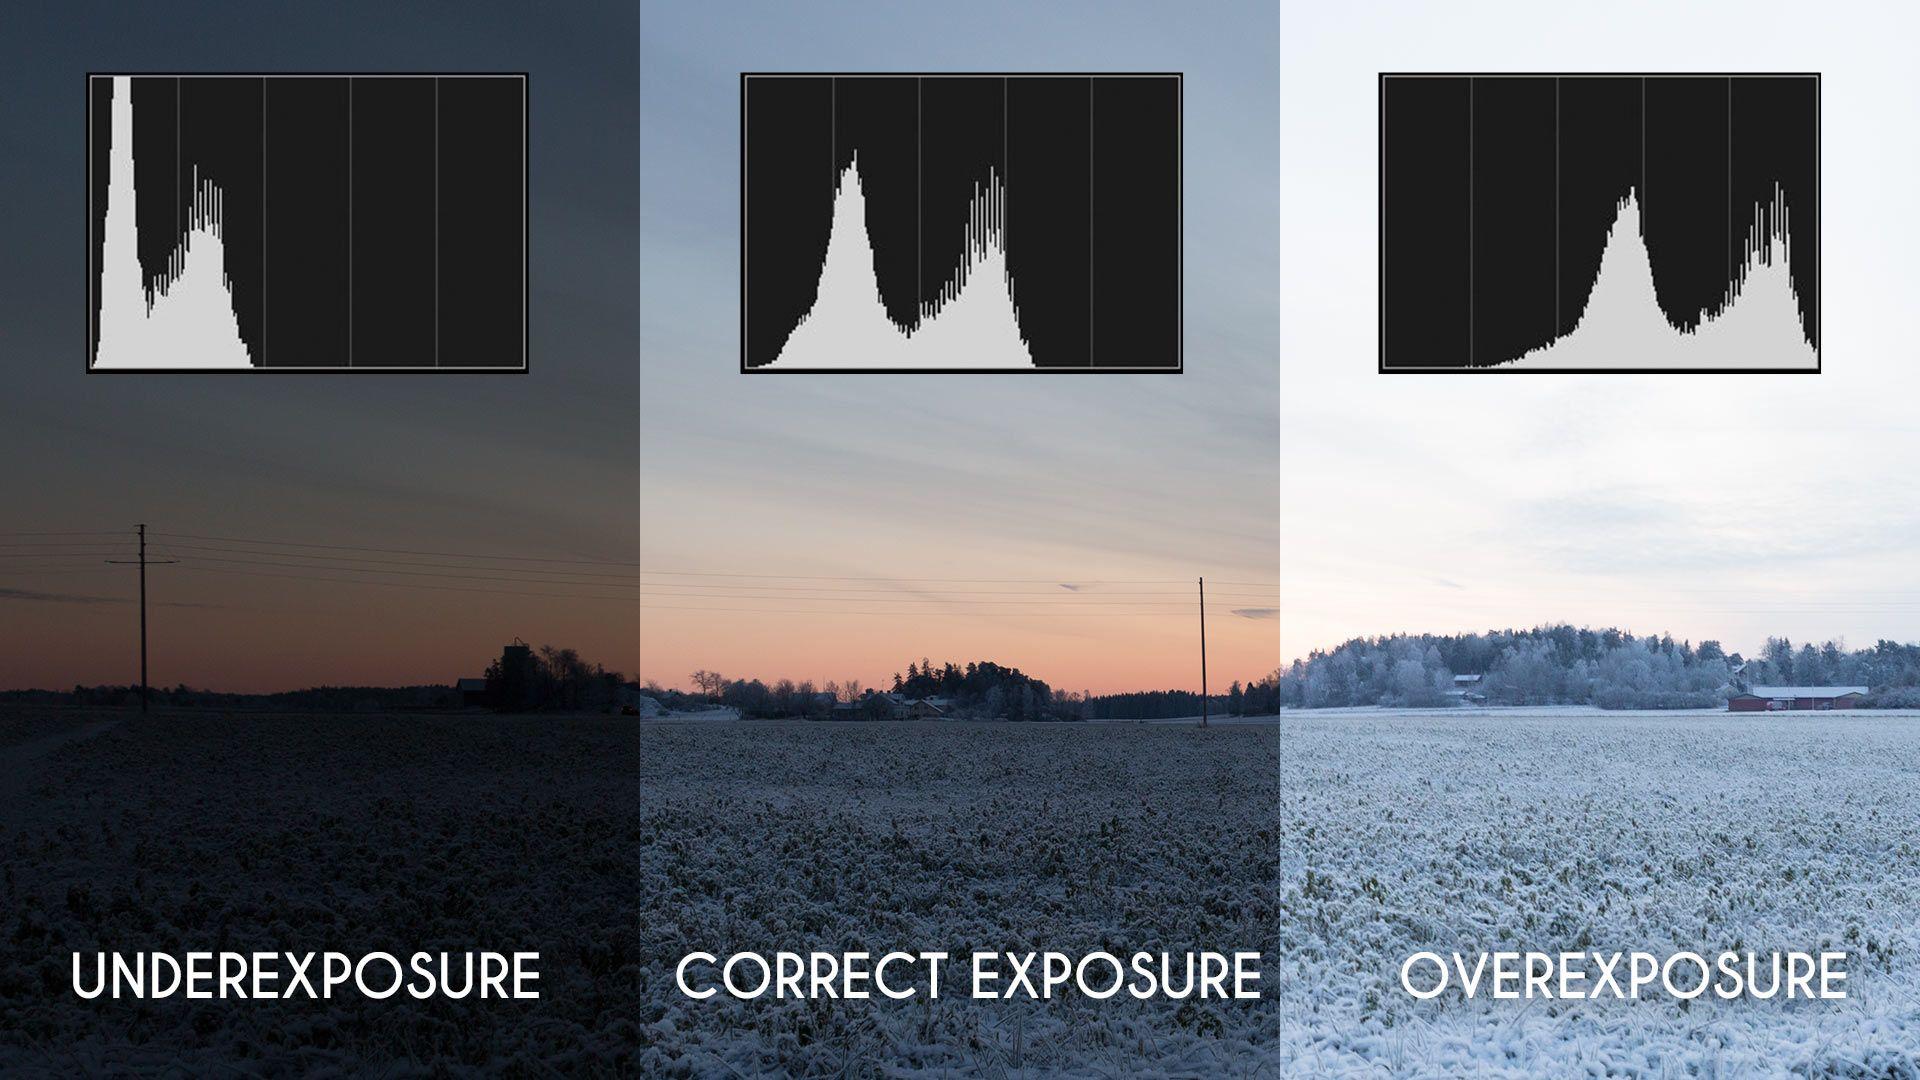 The Same Scene Underexposed Correctly Exposed And Overexposed Histogram Photo Exposure